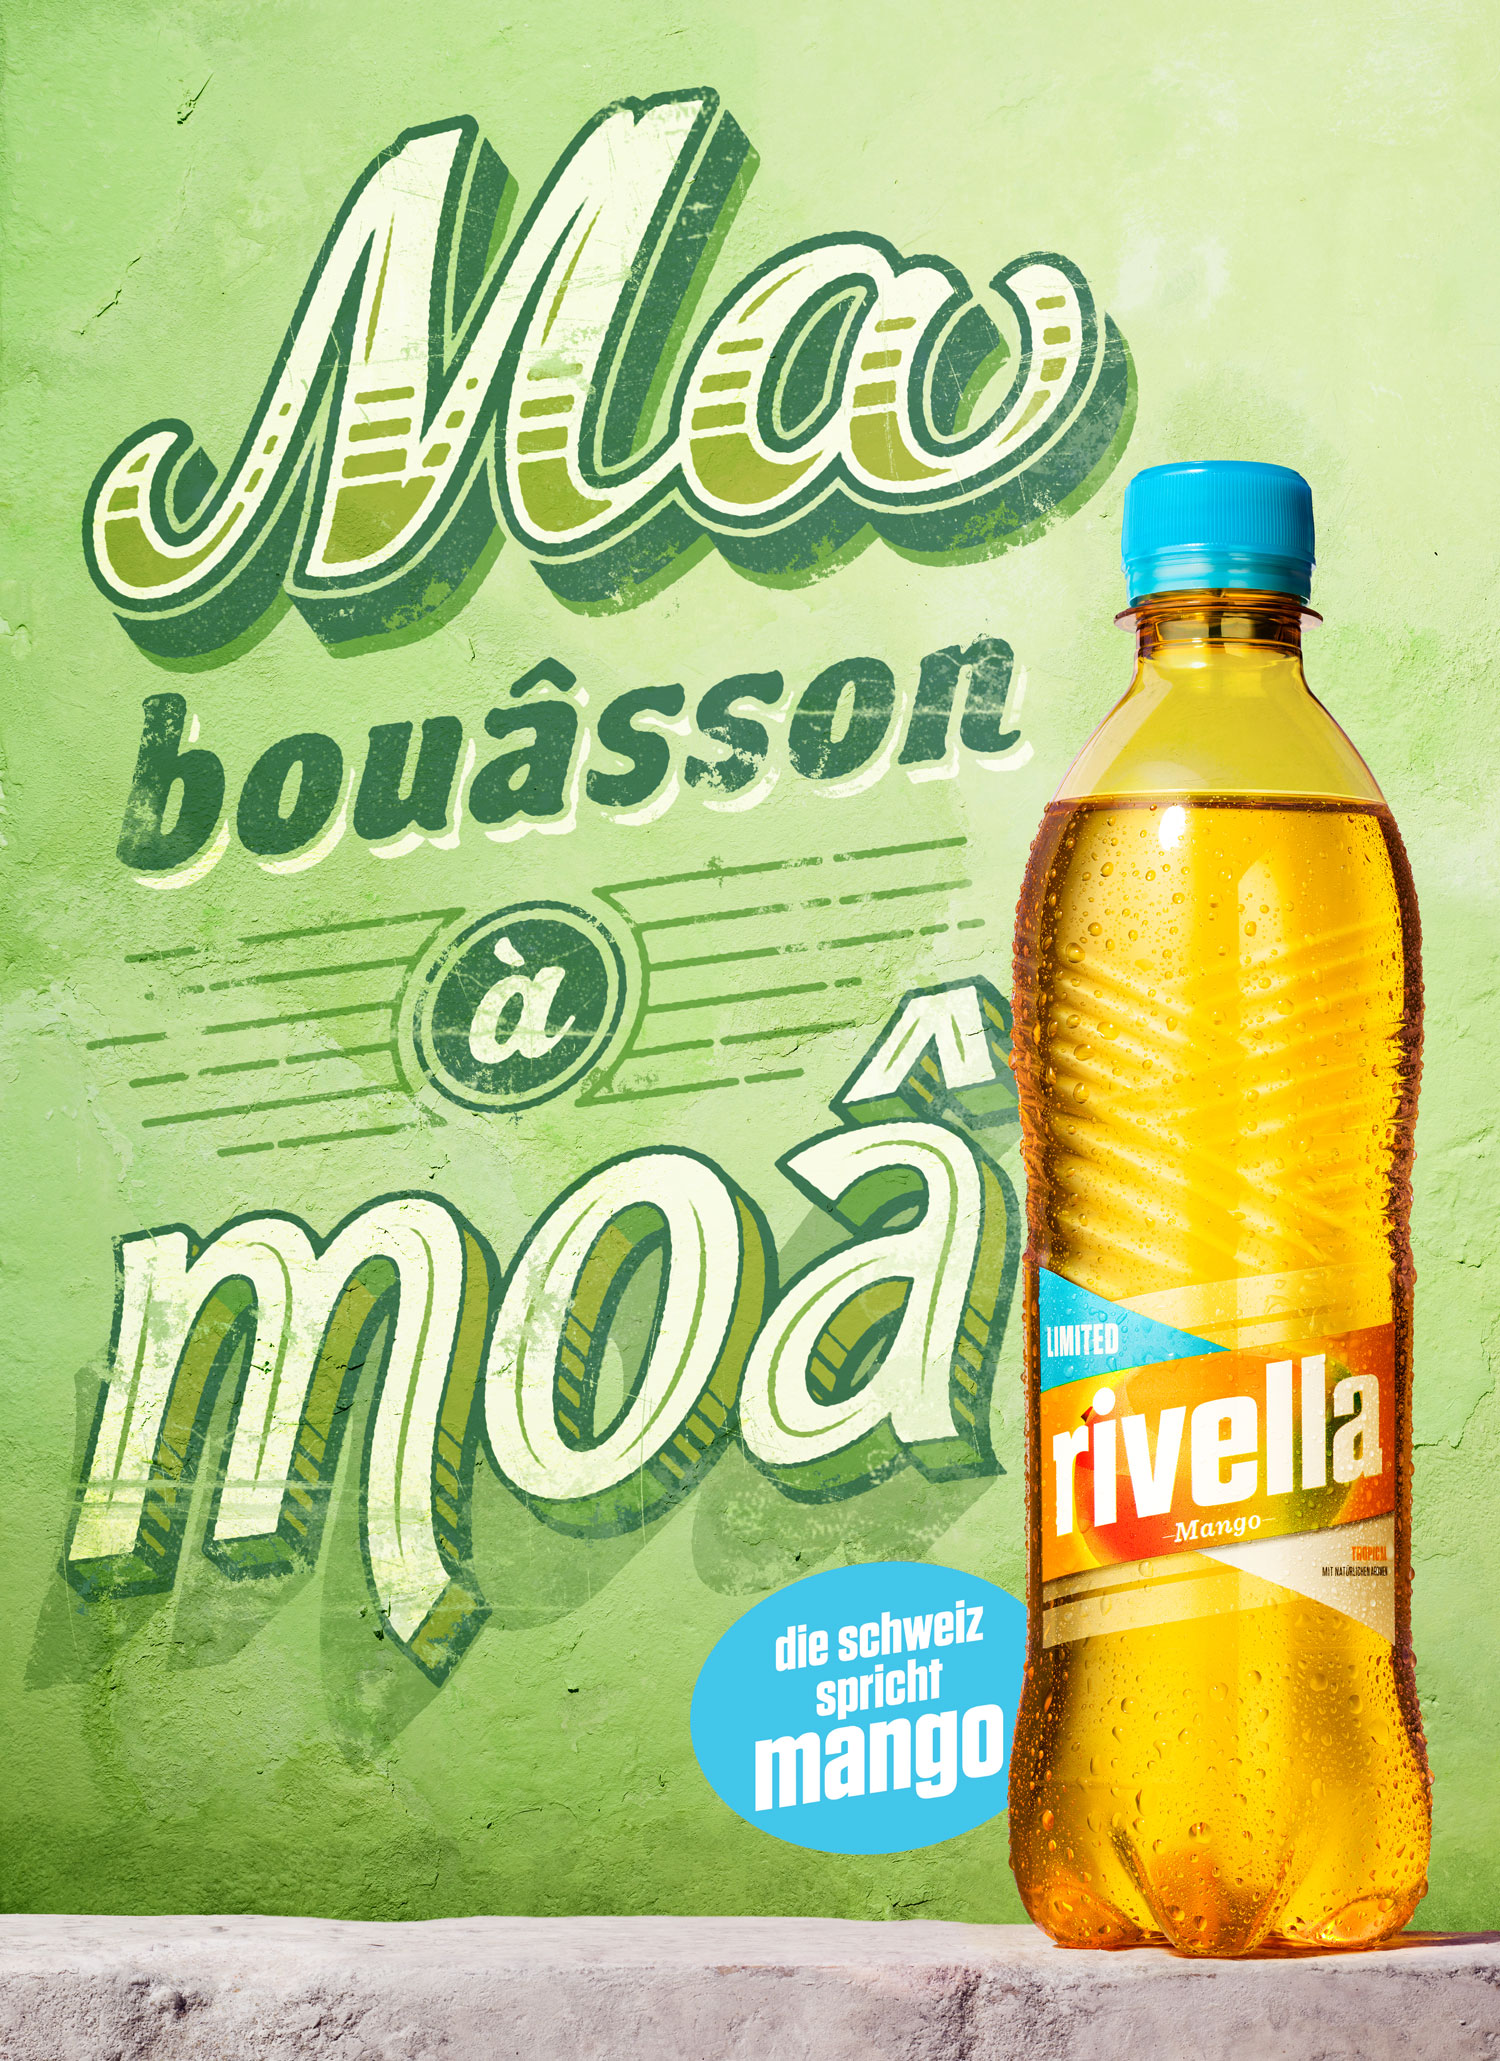 Rivella-Mango---Ma-Bouasson-copy.jpg